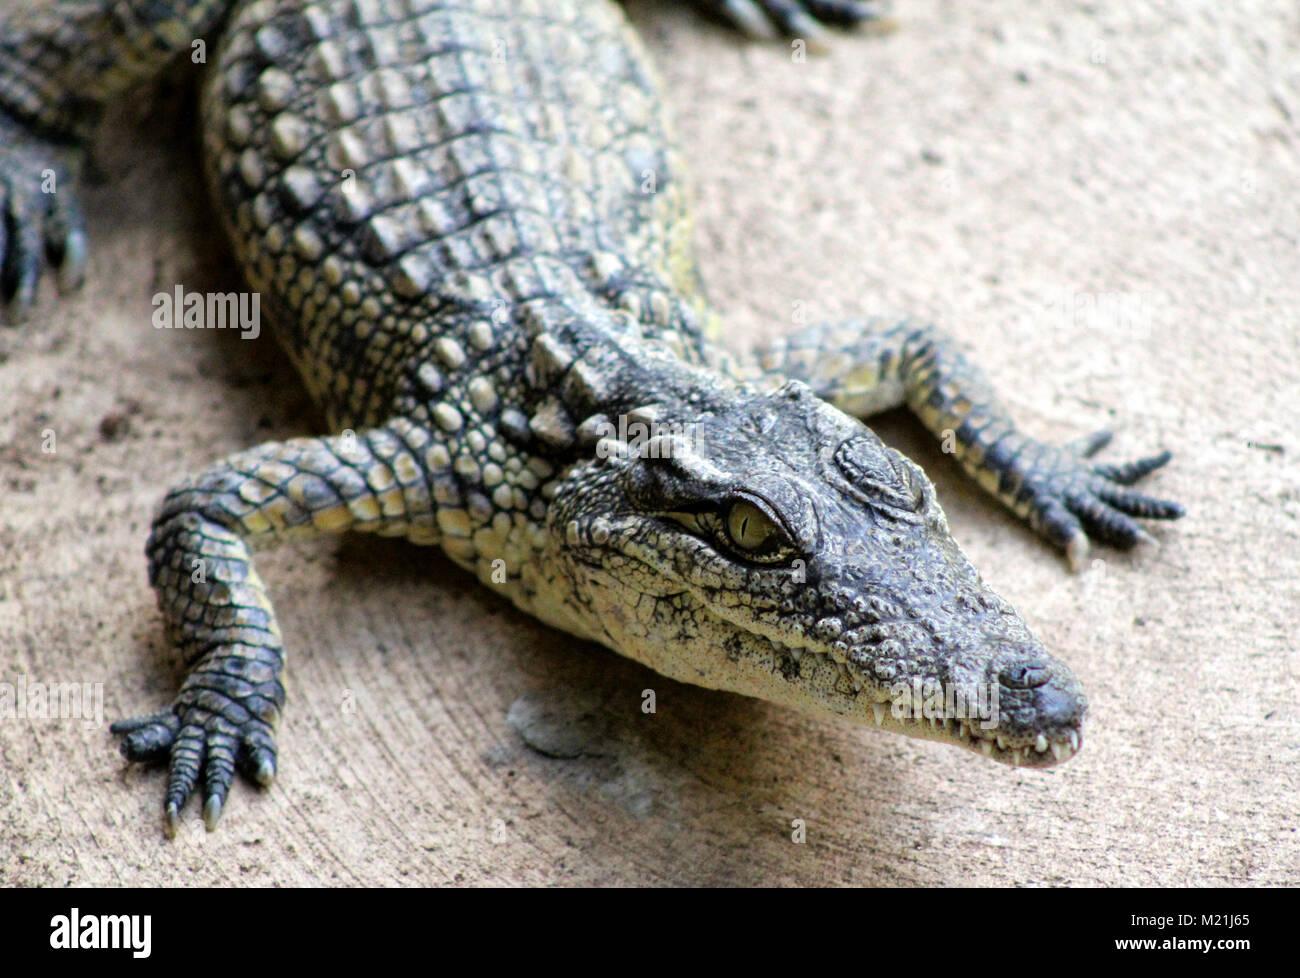 Nile crocodile at Kruger National Park South Africa - Stock Image